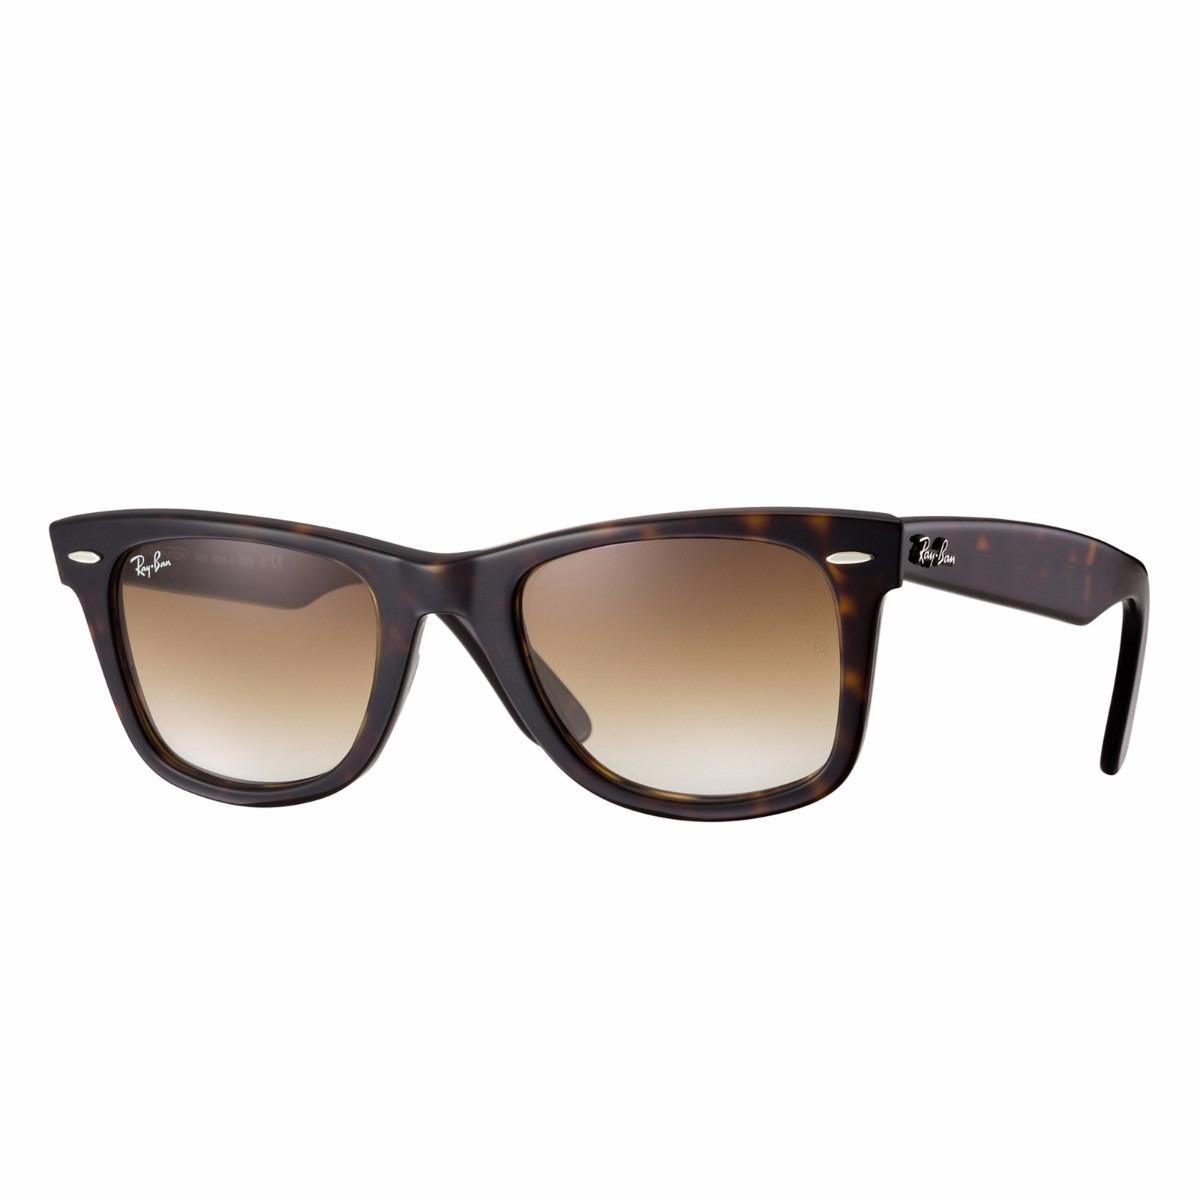 f15064f78fb66 oculos rayban wayfarer rb2140 masculino feminino oferta. Carregando zoom.